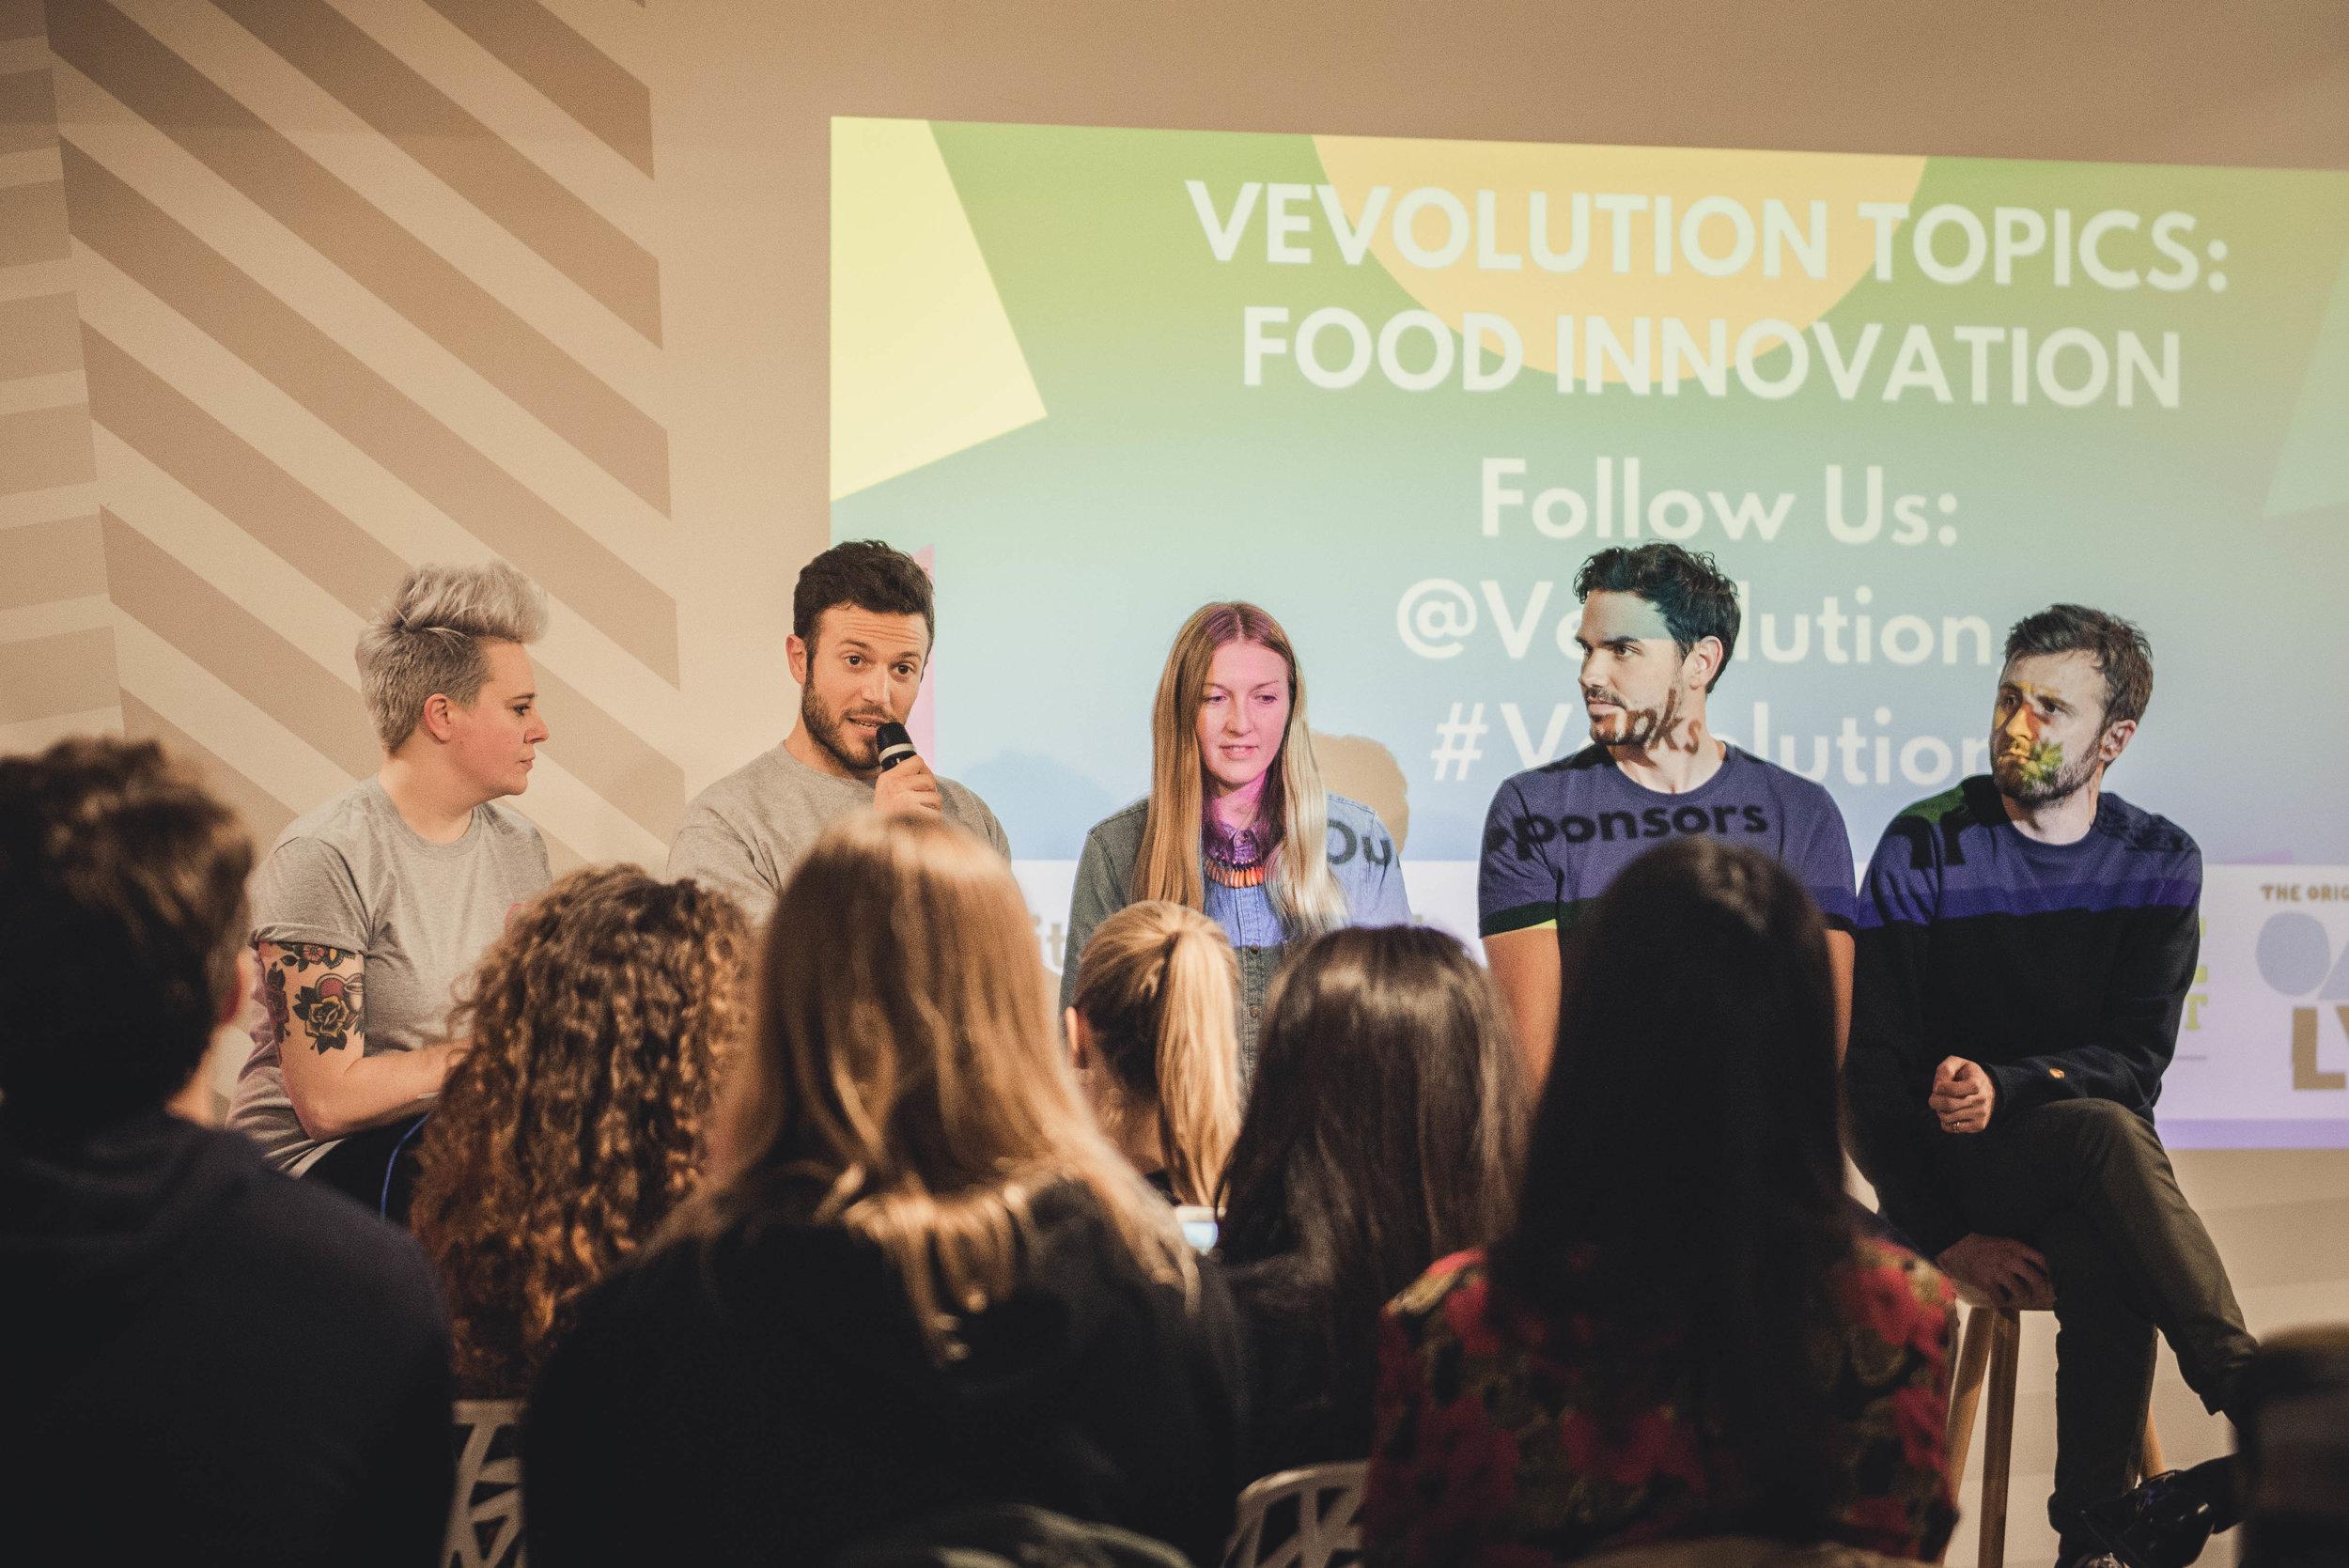 Vegan Food Leaders At Vevolution